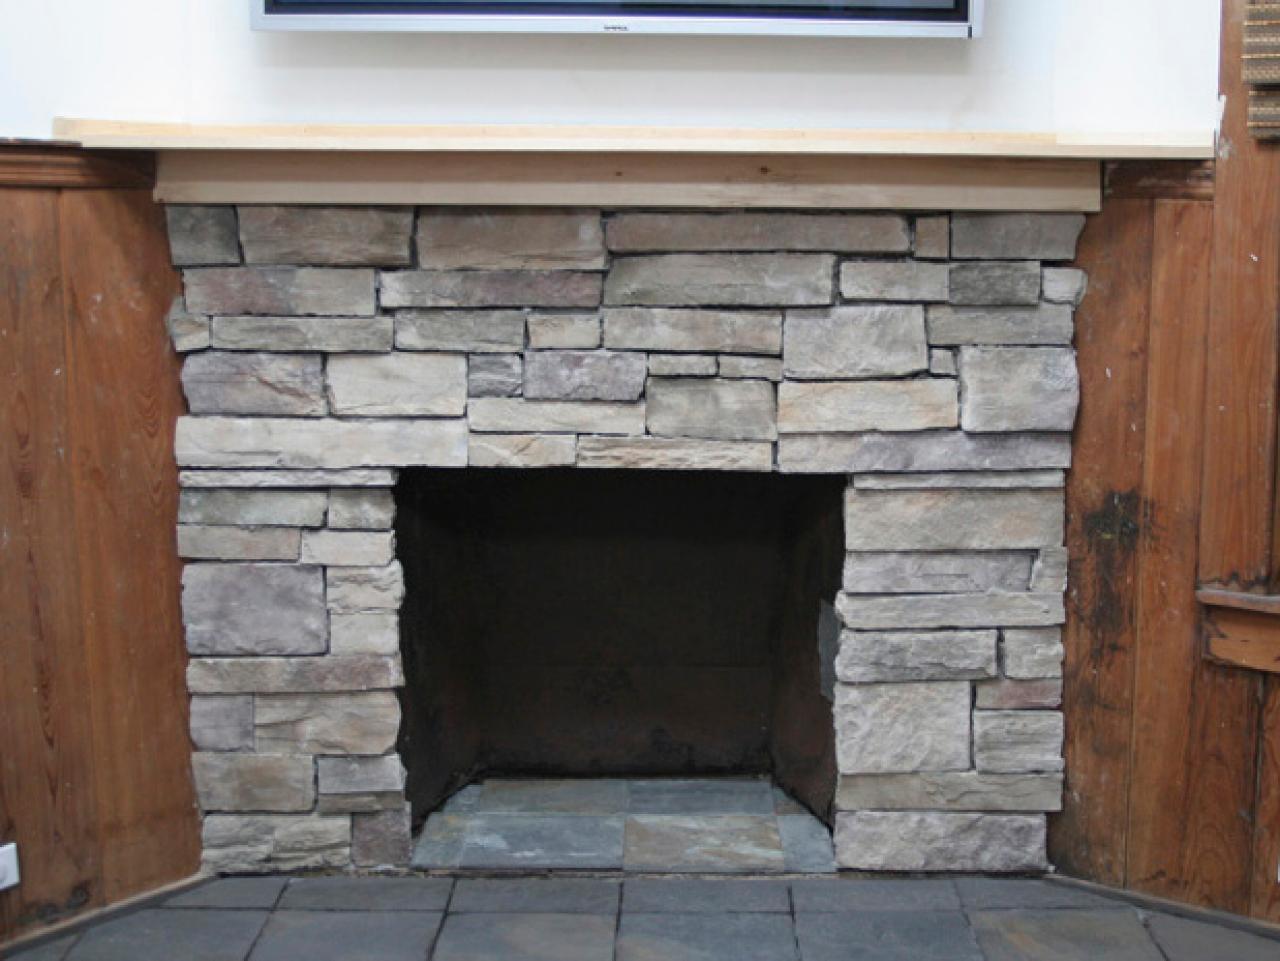 brick fireplace cover up ideas brick fireplace cover up ideas inspirational how to cover a brick fireplace with stone